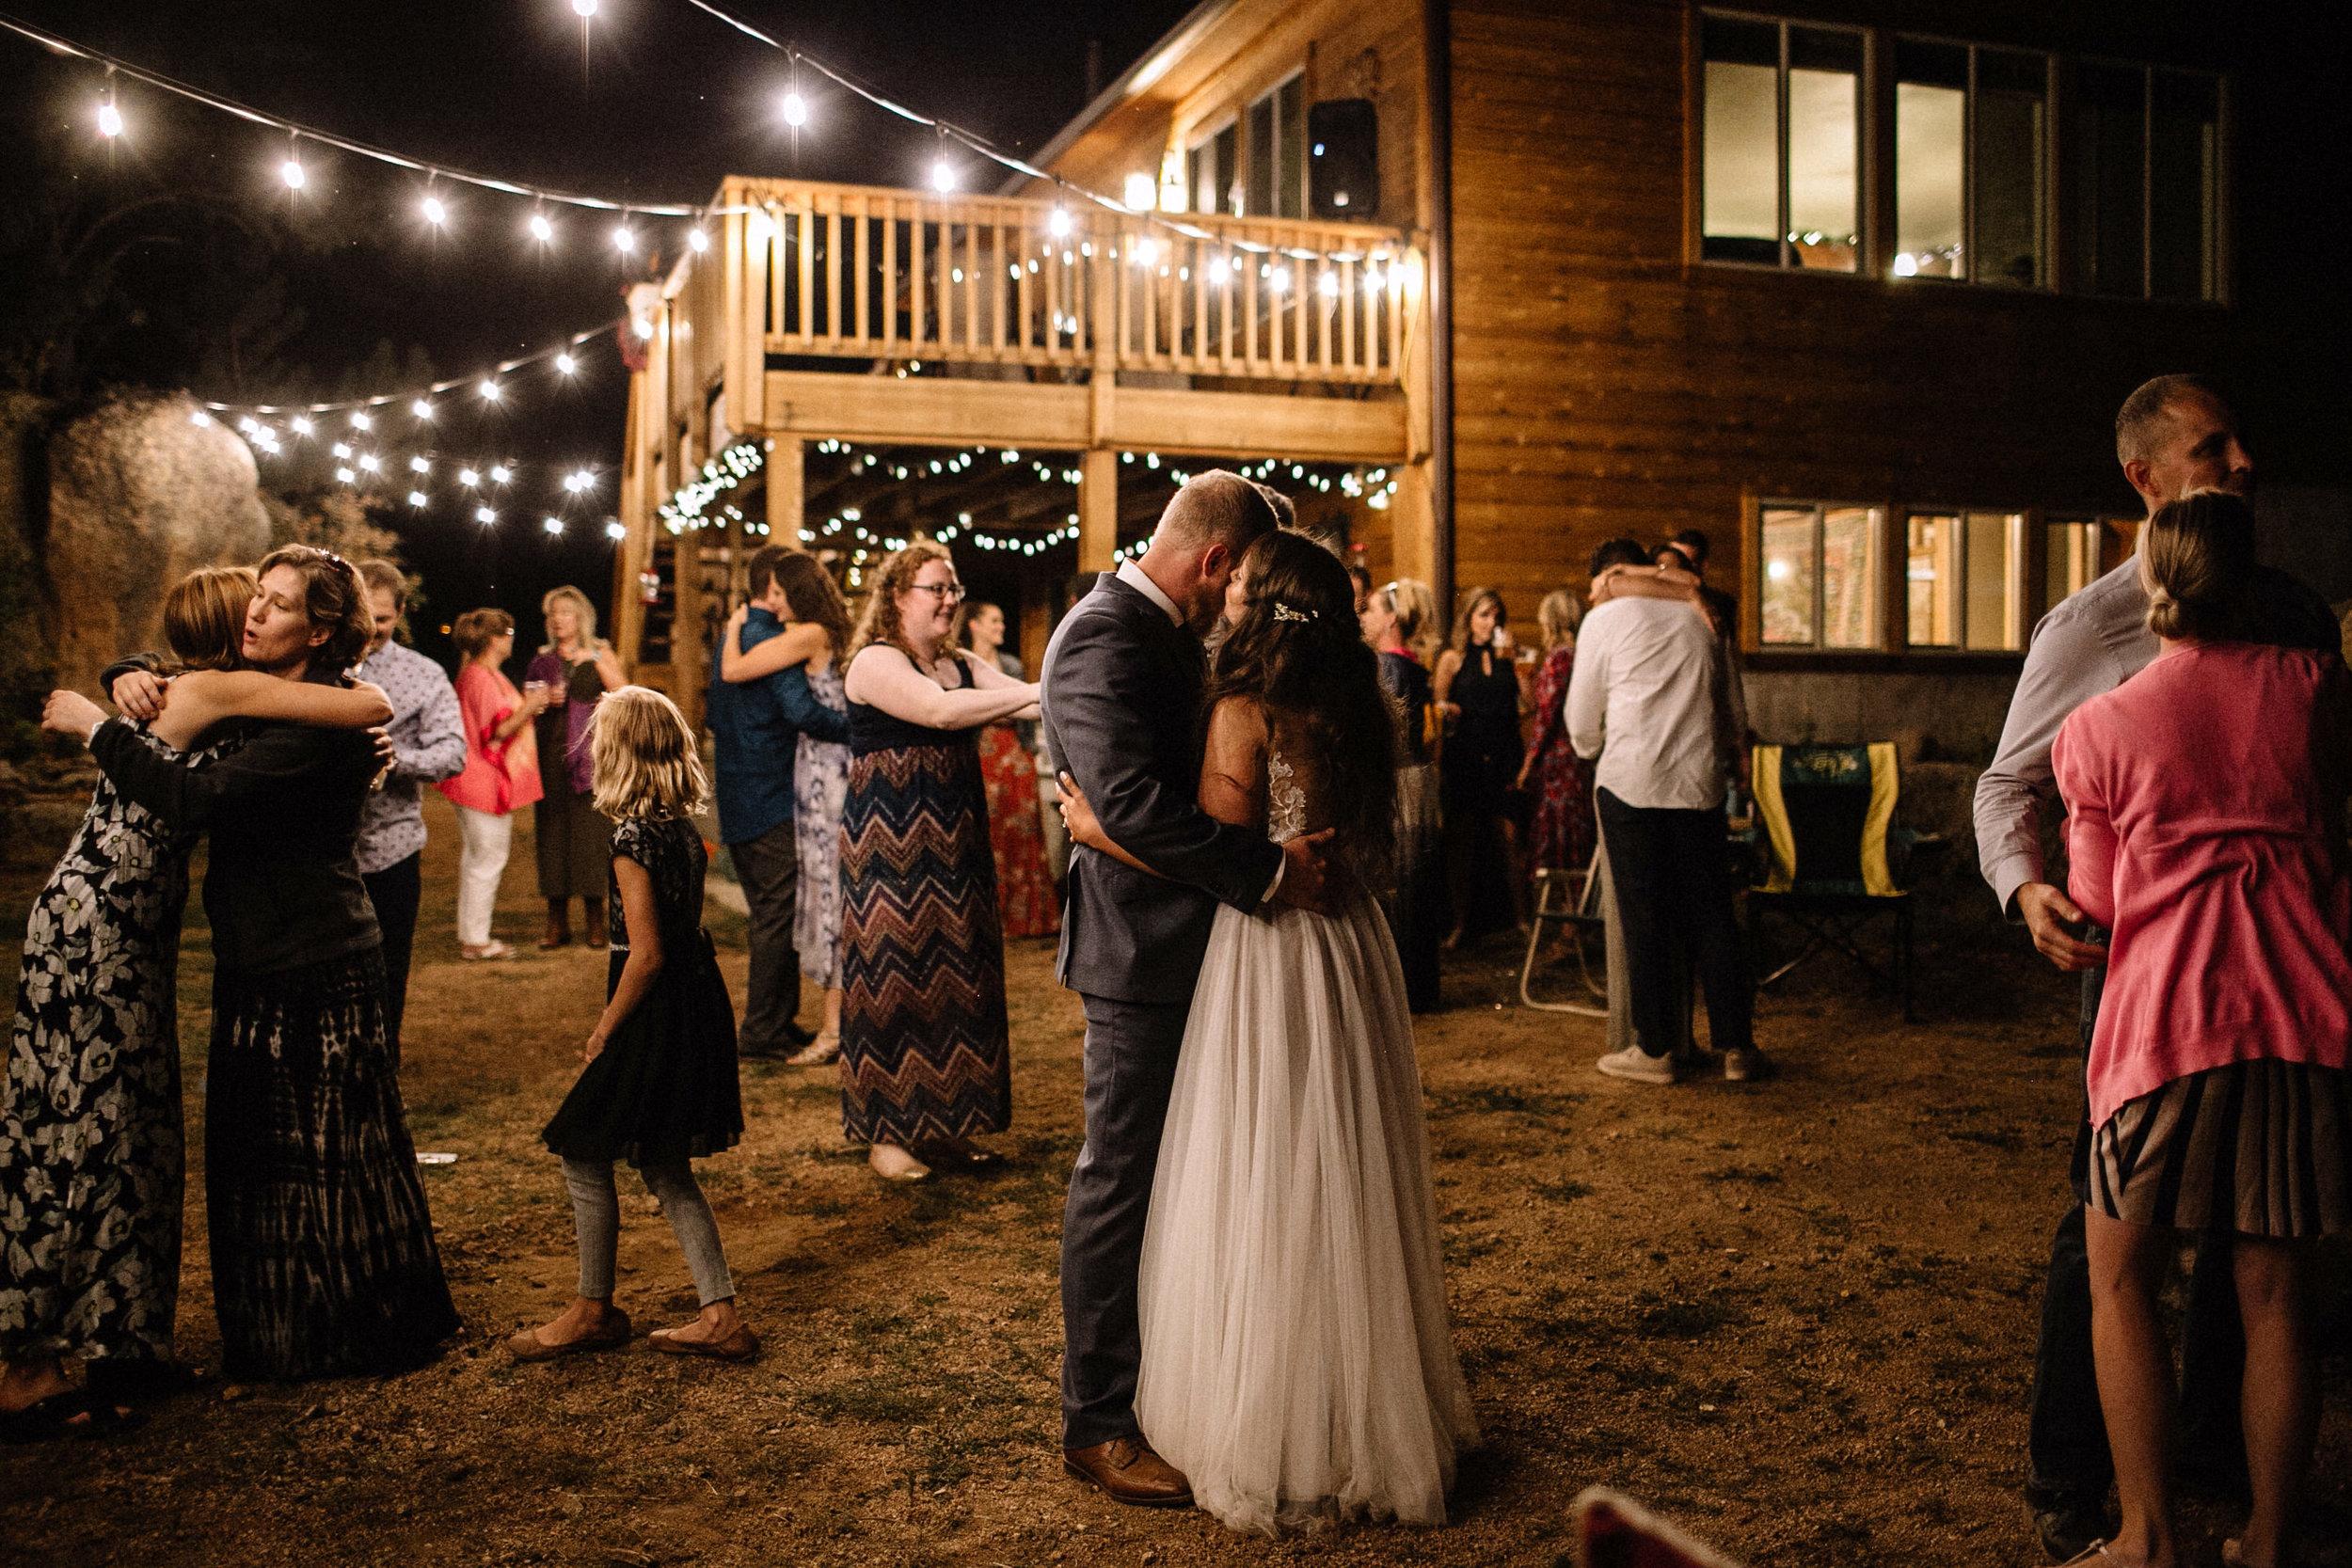 Liz Osban Photography Vedauwoo Buford Wyoming Happy Jack Wedding Elopement Destination Small Forest Cheyenne Laramie Medicine Bow National Forest Reception Belafuco's Pizza24.jpg